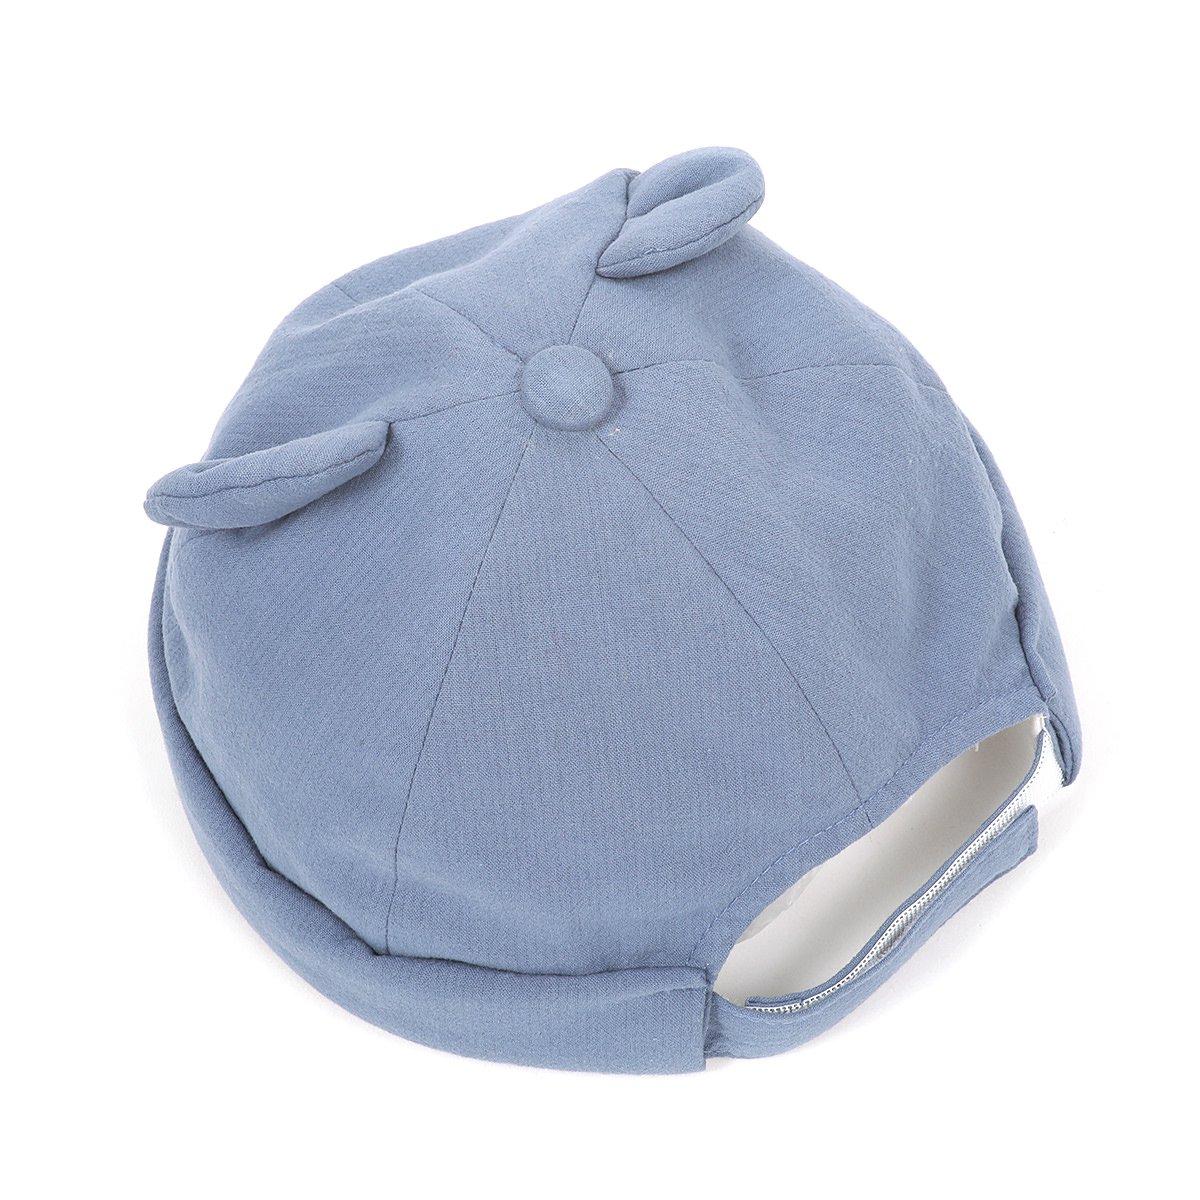 【BABY】Baby Linen Bear Cap 詳細画像7